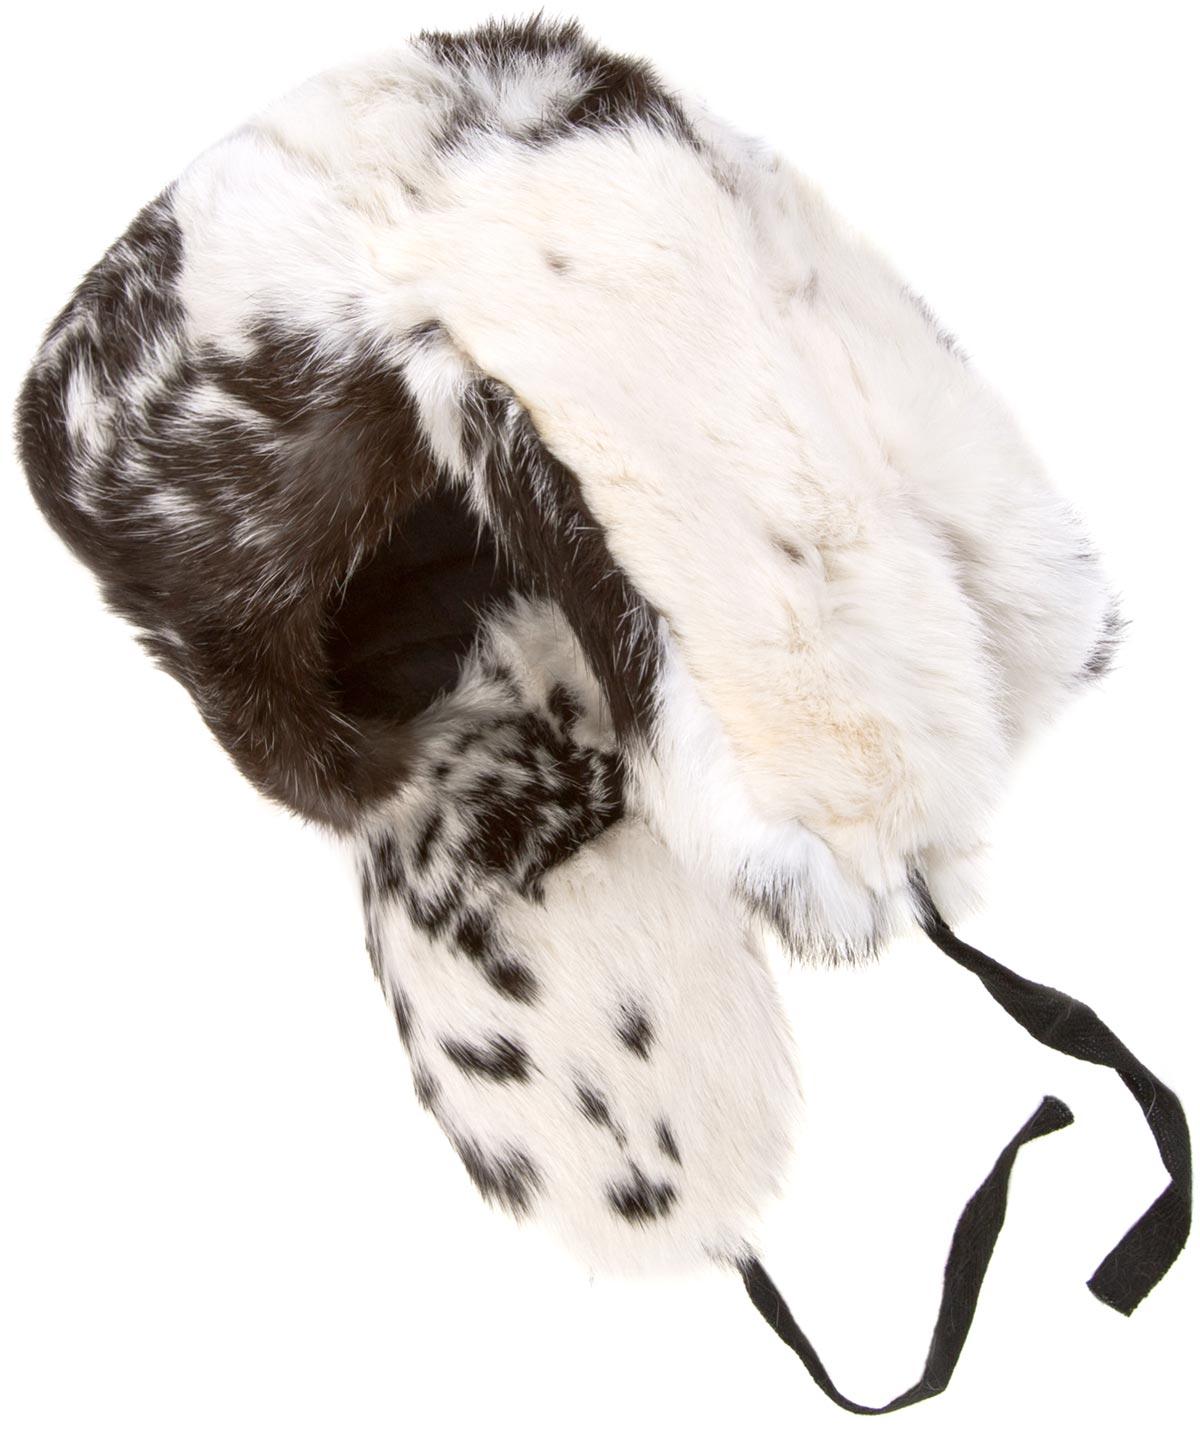 757d7e0b8 Rabbit fur ushanka winter hat. White and black.